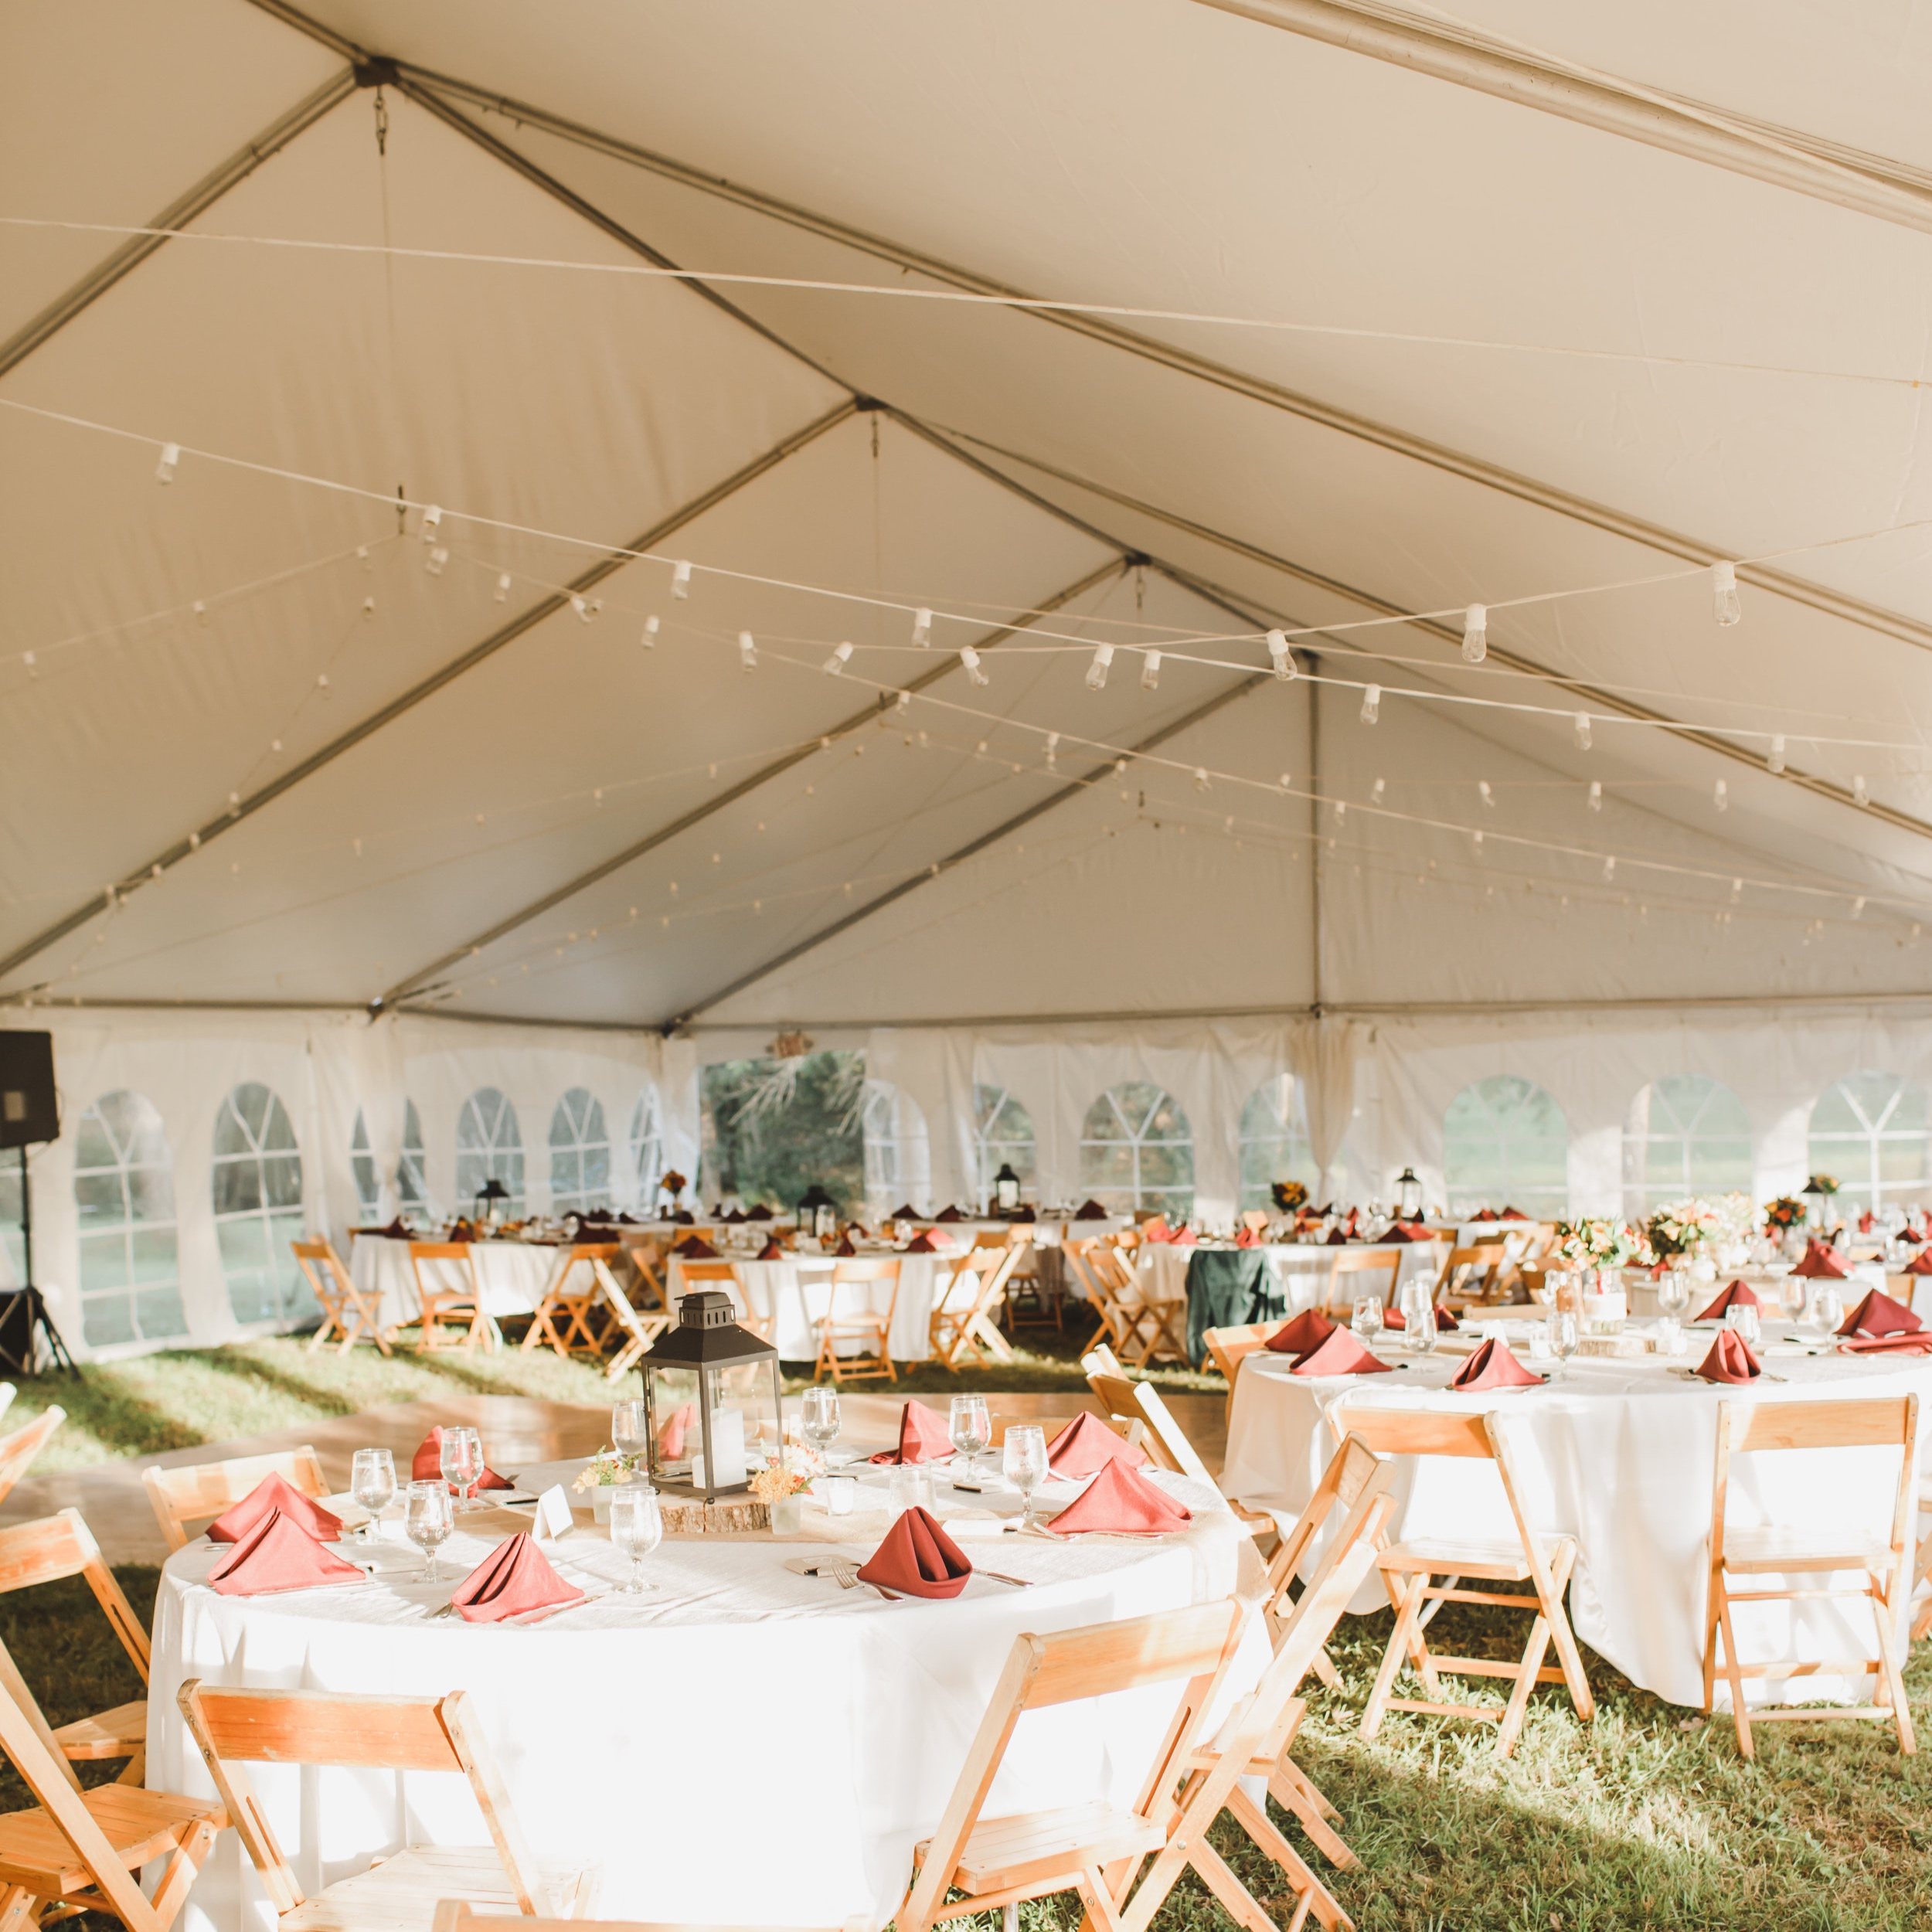 Fling - Virginia Wedding Photographer - Photography by Amy Nicole-4568-10.jpg